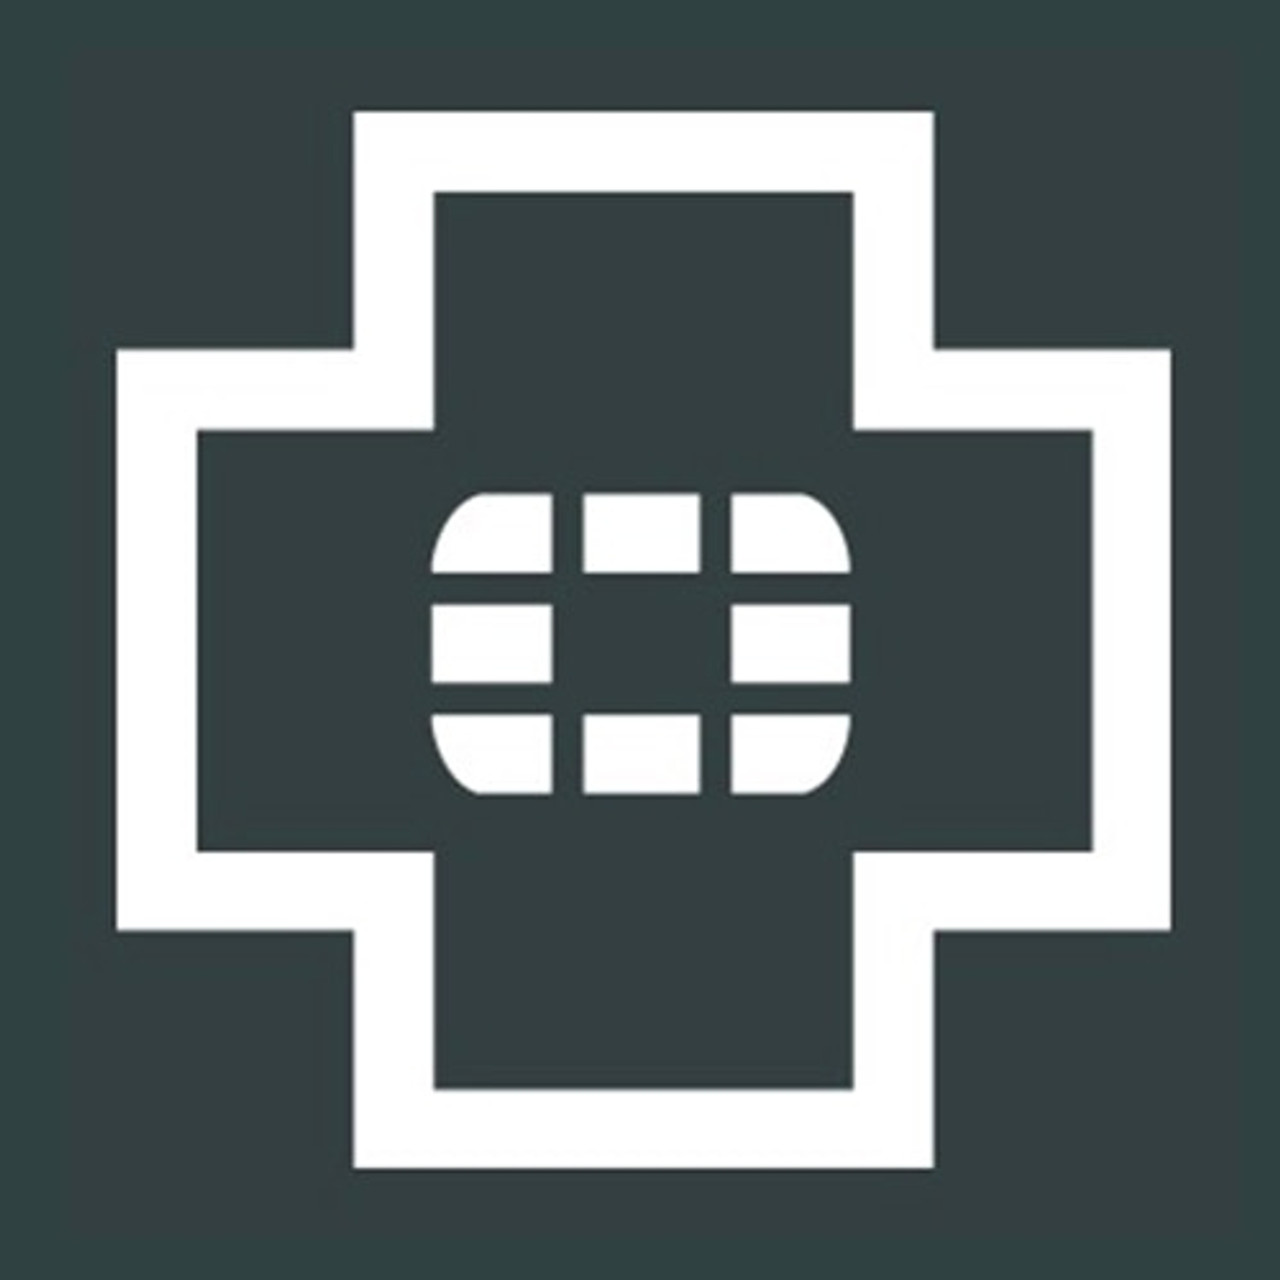 FortiGate-301E - 8x5 FortiCare Contract - 12 months